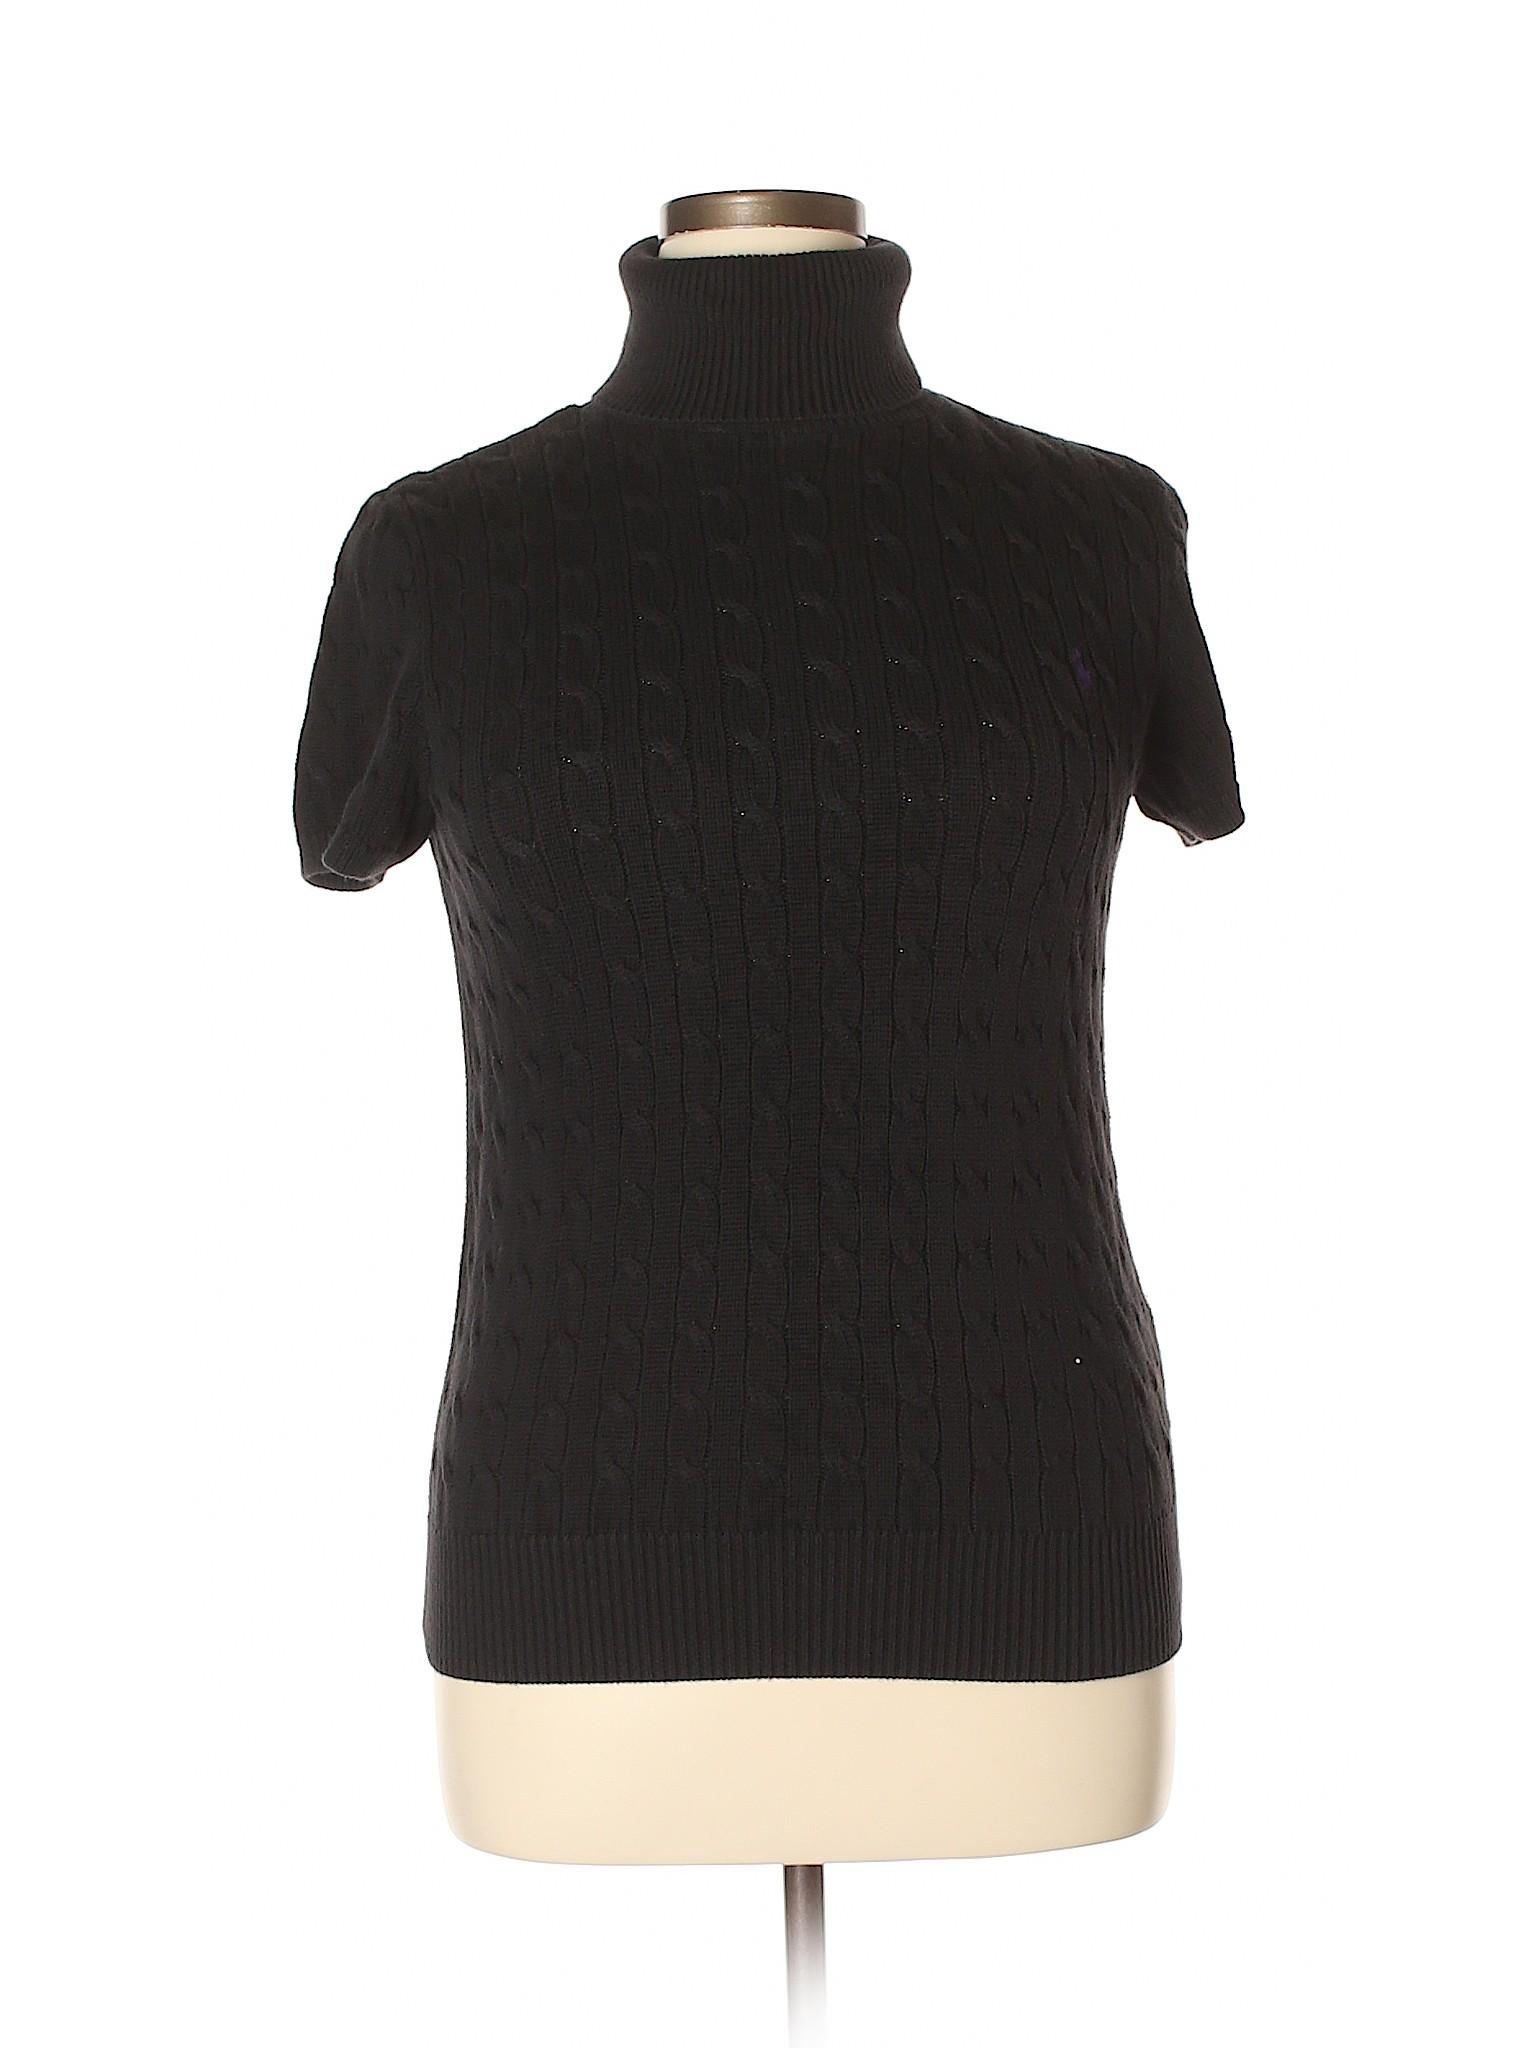 Sport Lauren Ralph Turtleneck winter Boutique Sweater fw1qt8